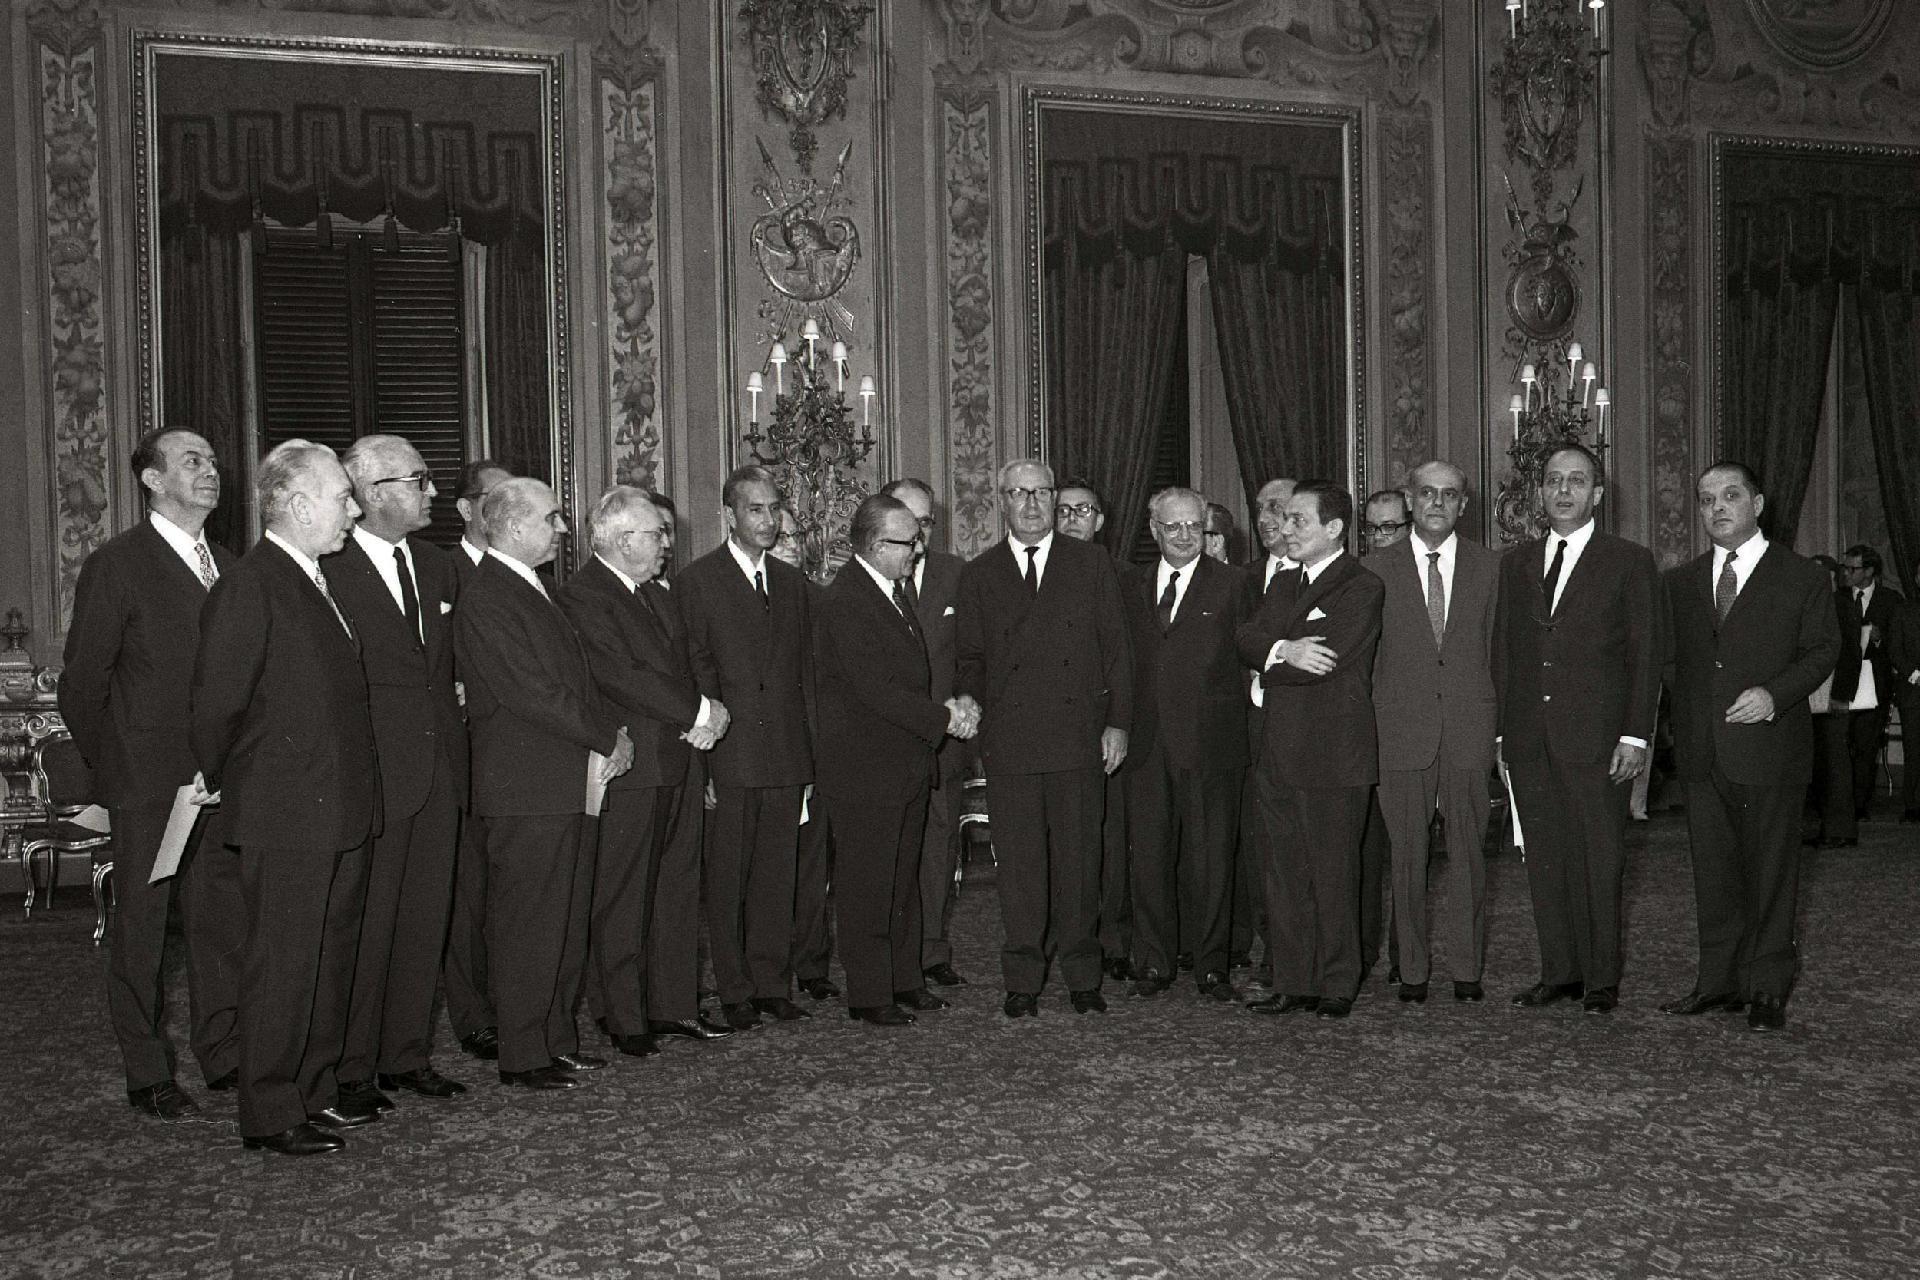 II Governo Rumor, 6 agosto 1969